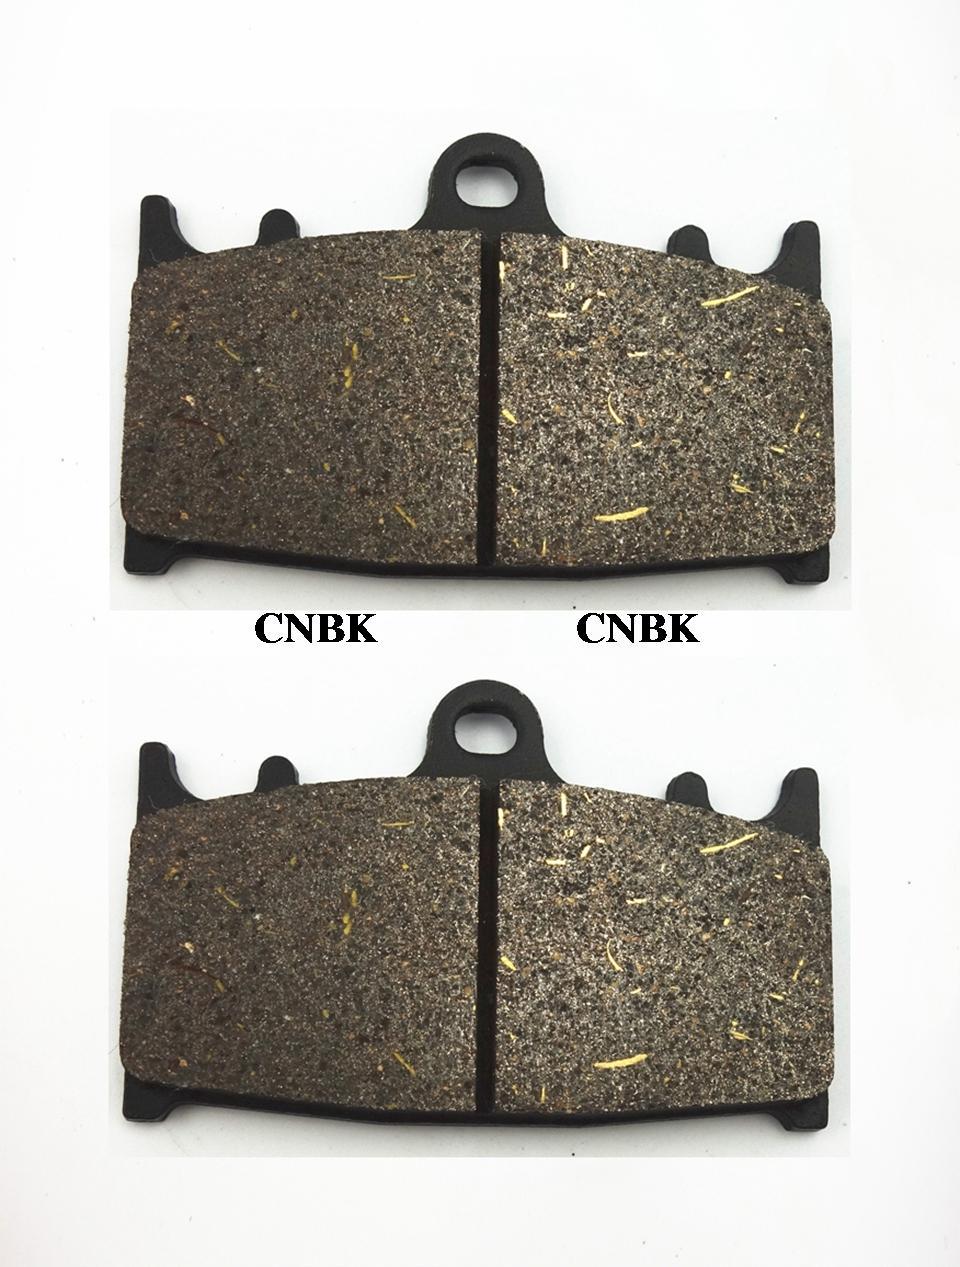 2006 - 2008 2007 Semi Met Front Left &amp; Right Disc Brake Pads fit for SUZUKI 600 GSR K6 / K7 / K8 GSR600 CNBK<br><br>Aliexpress